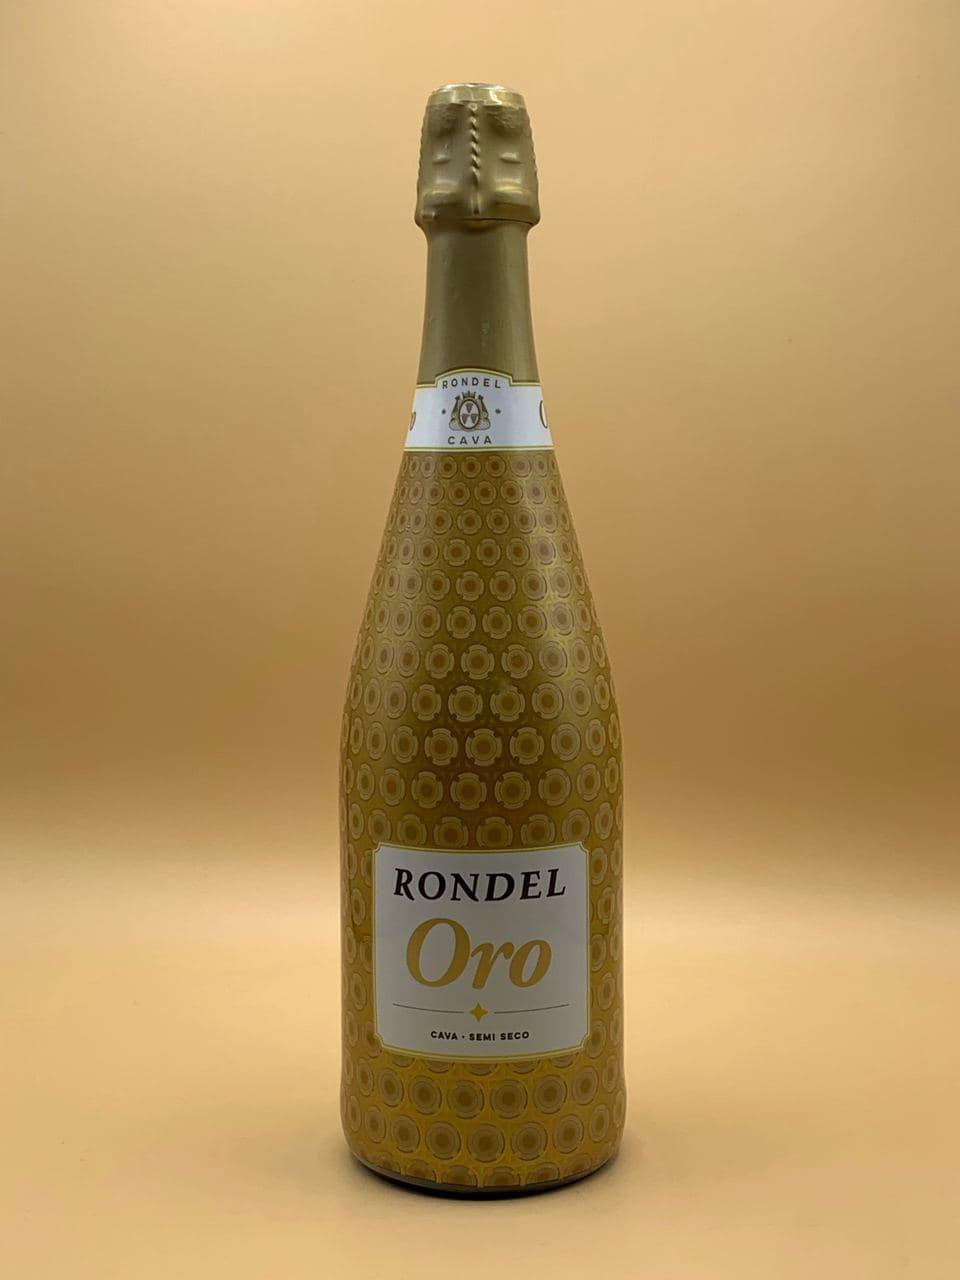 Игристое вино Rondel Oro Cava 0.75L Рондел Оро Кава 0.75л